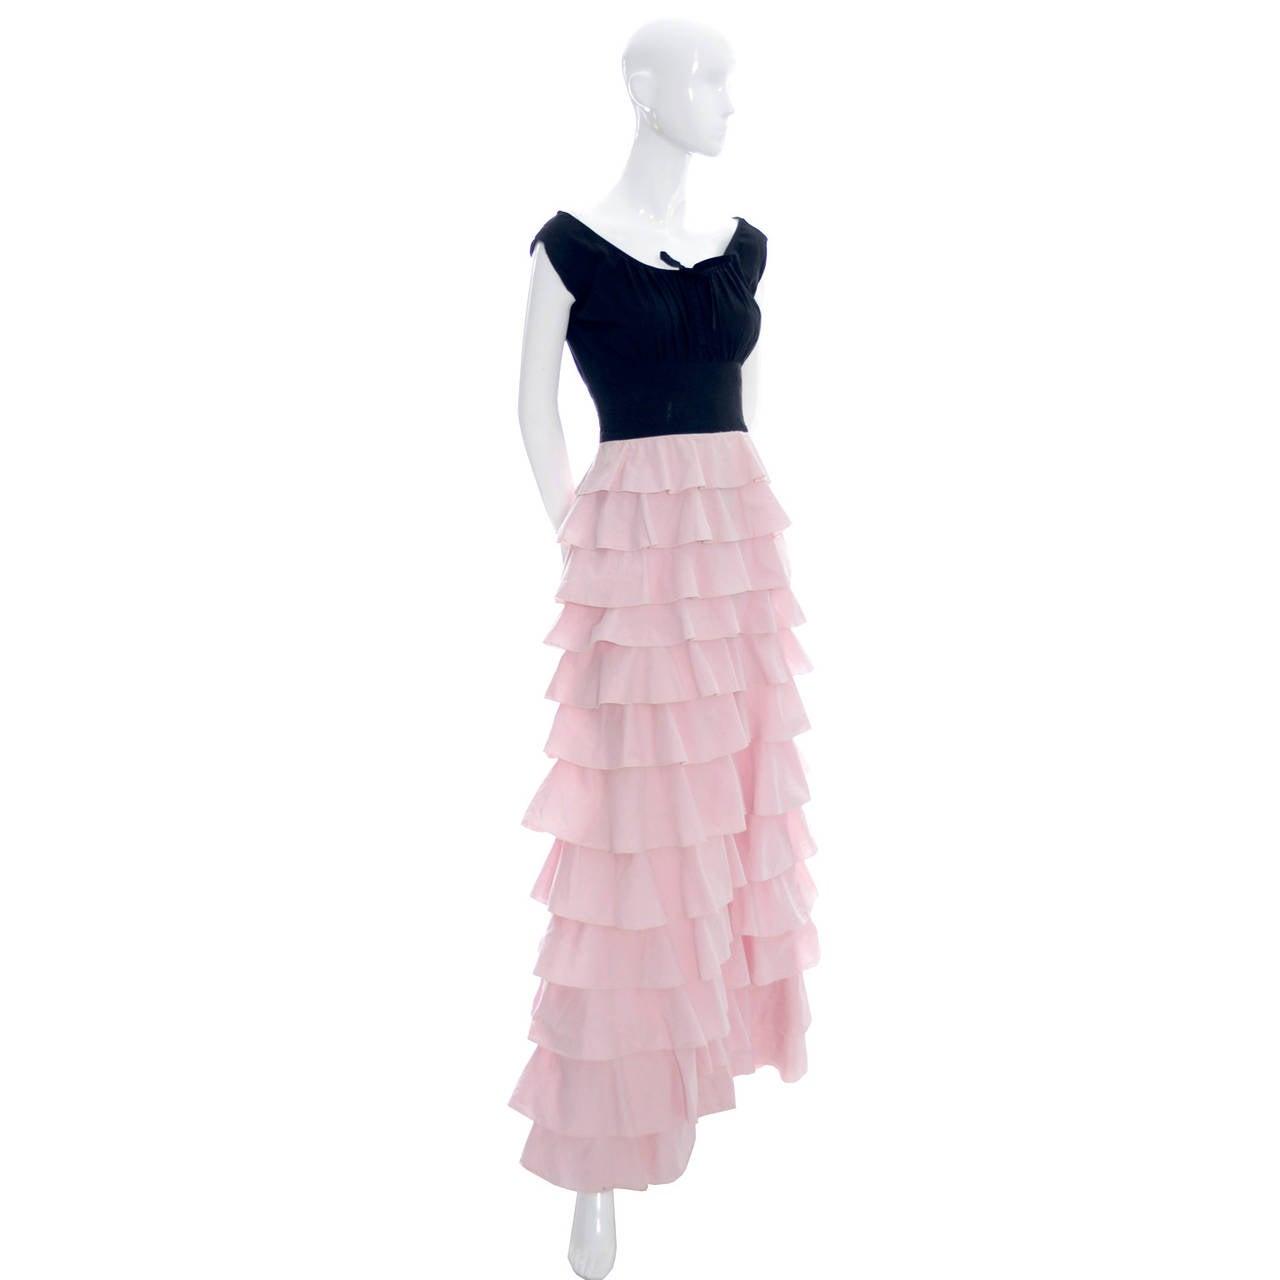 Women's 1940s Vintage Gilbert Adrian Original Dress Pink Ruffles Rare Designer Gown For Sale